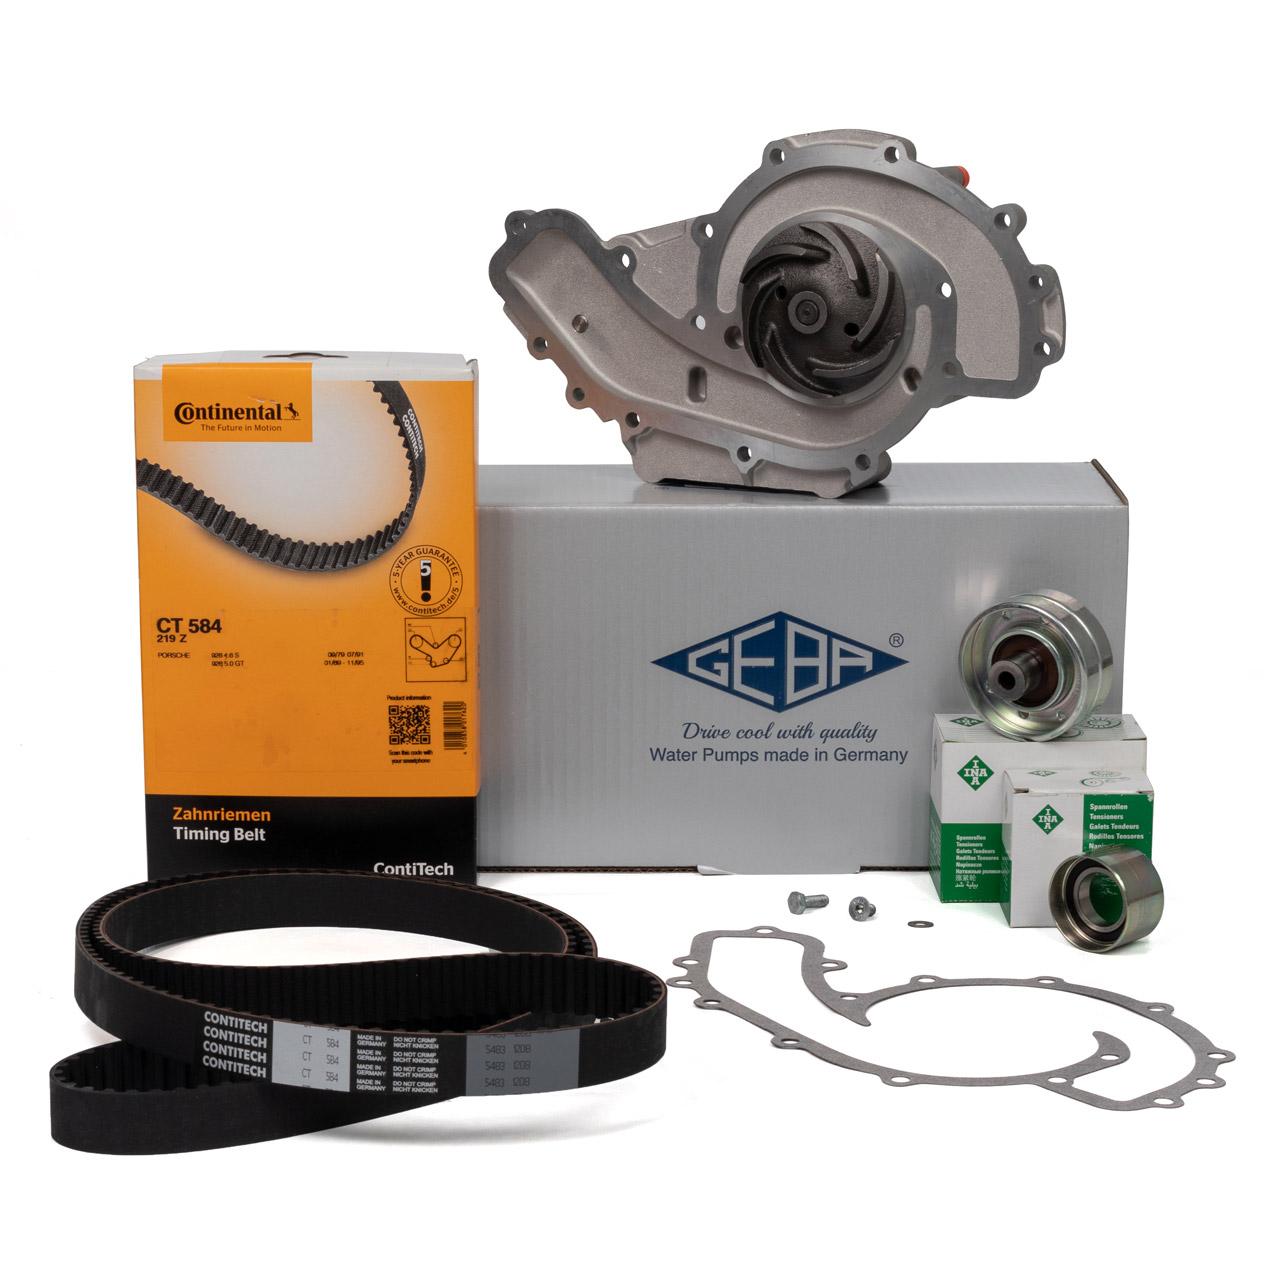 CONTI Zahnriemen + INA Rollen + GEBA Wasserpumpe PORSCHE 928 5.0 S / GT + 5.4 GTS